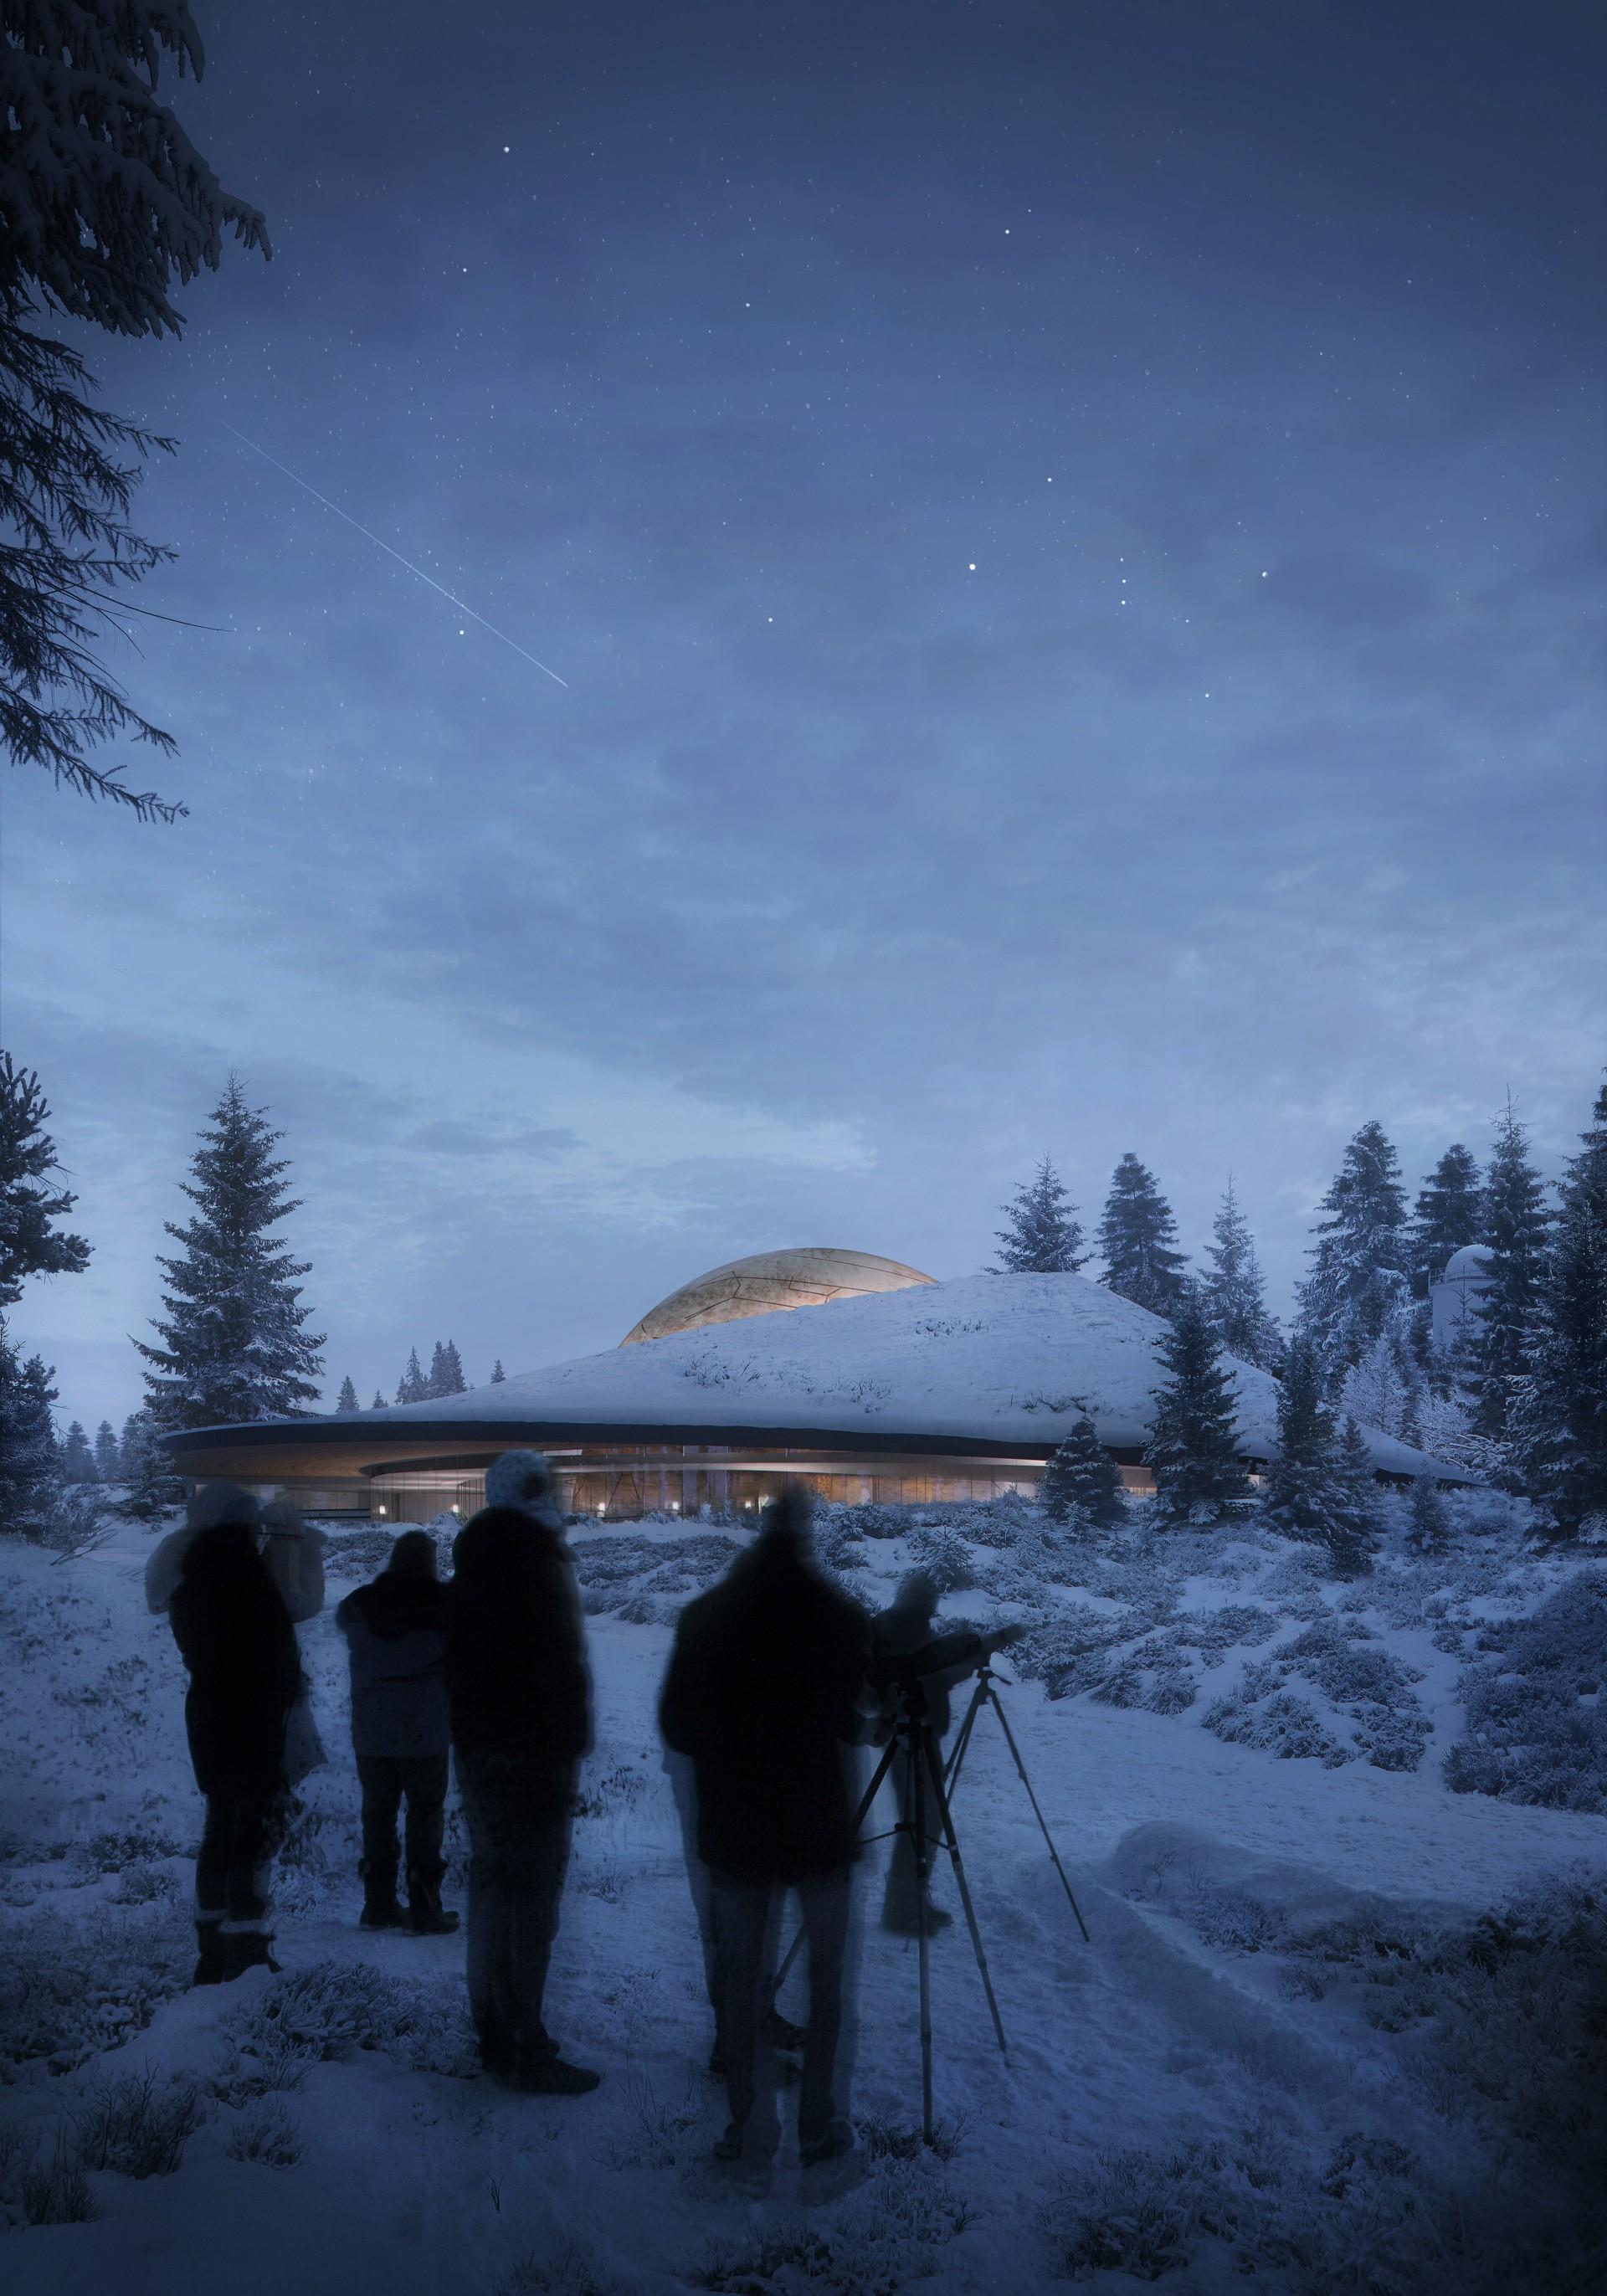 Snøhetta Planetario e centro visitatori Solobservatoriet Norvegia